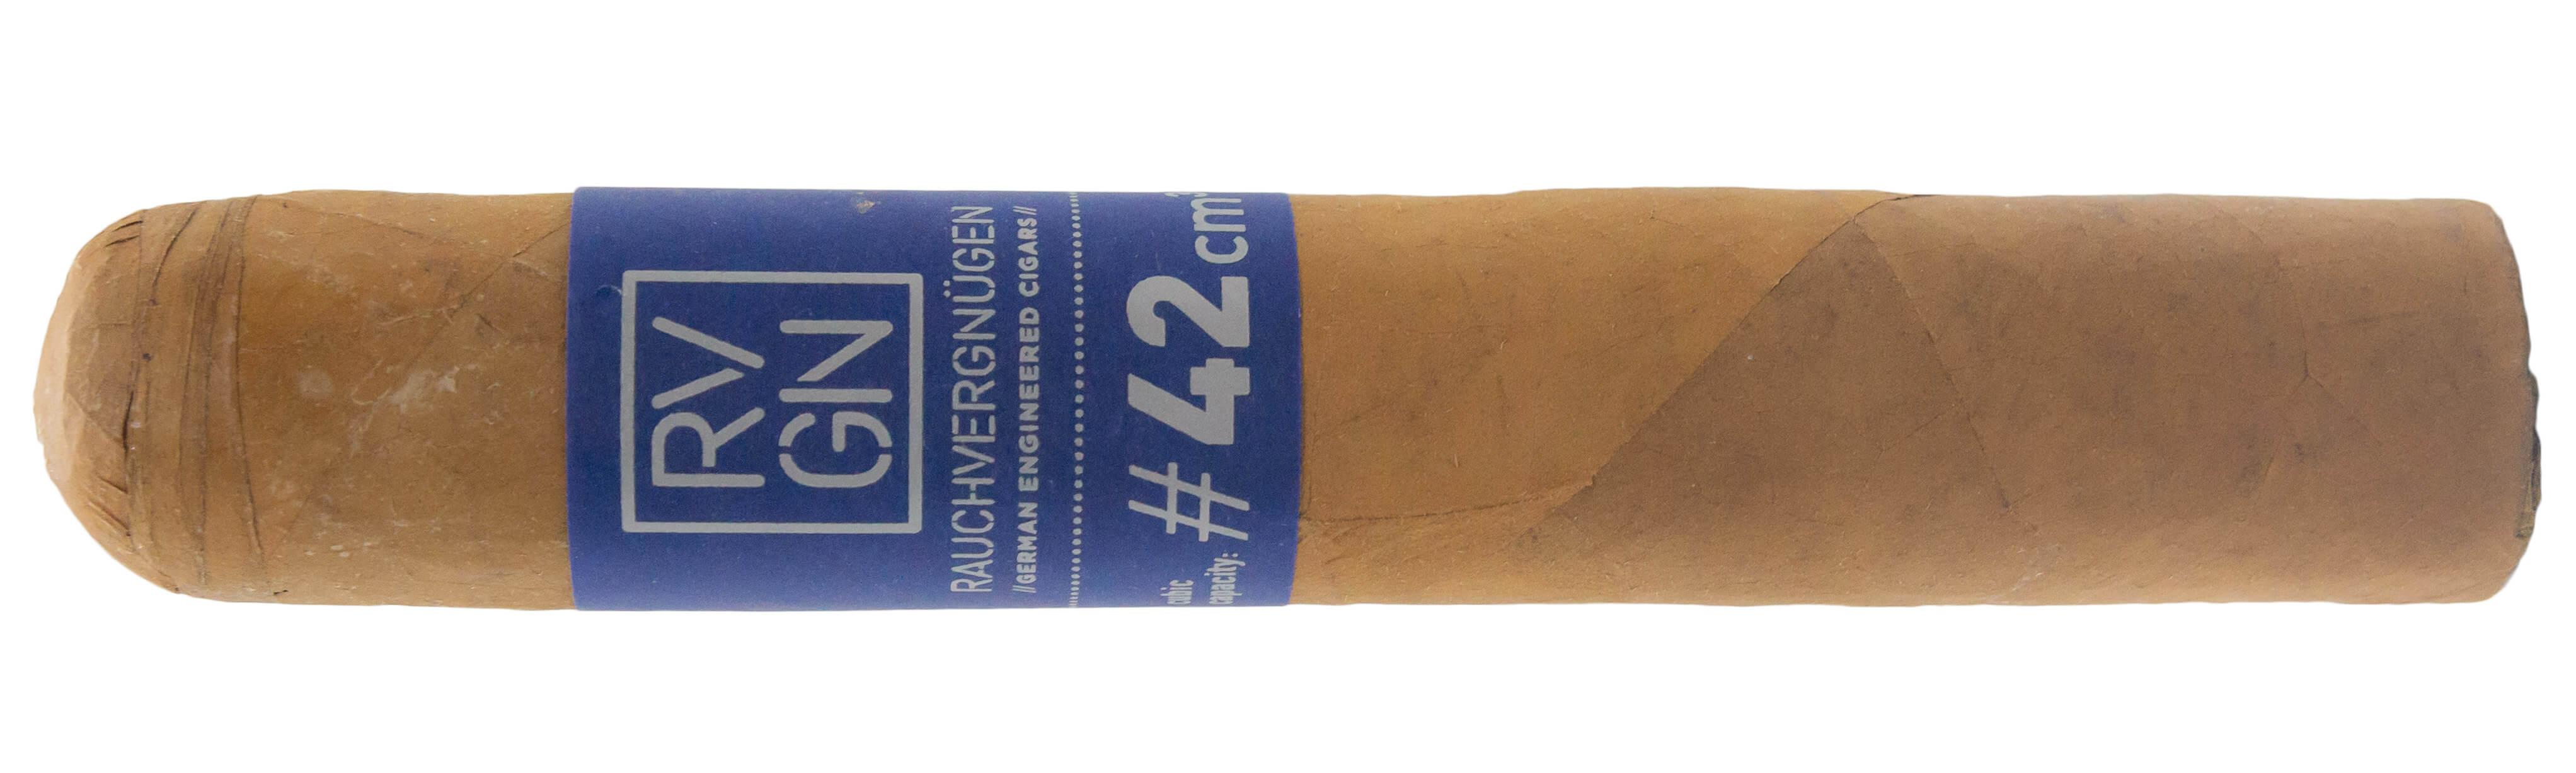 Blind Cigar Review: Rauchvergnügen | RVGN #42